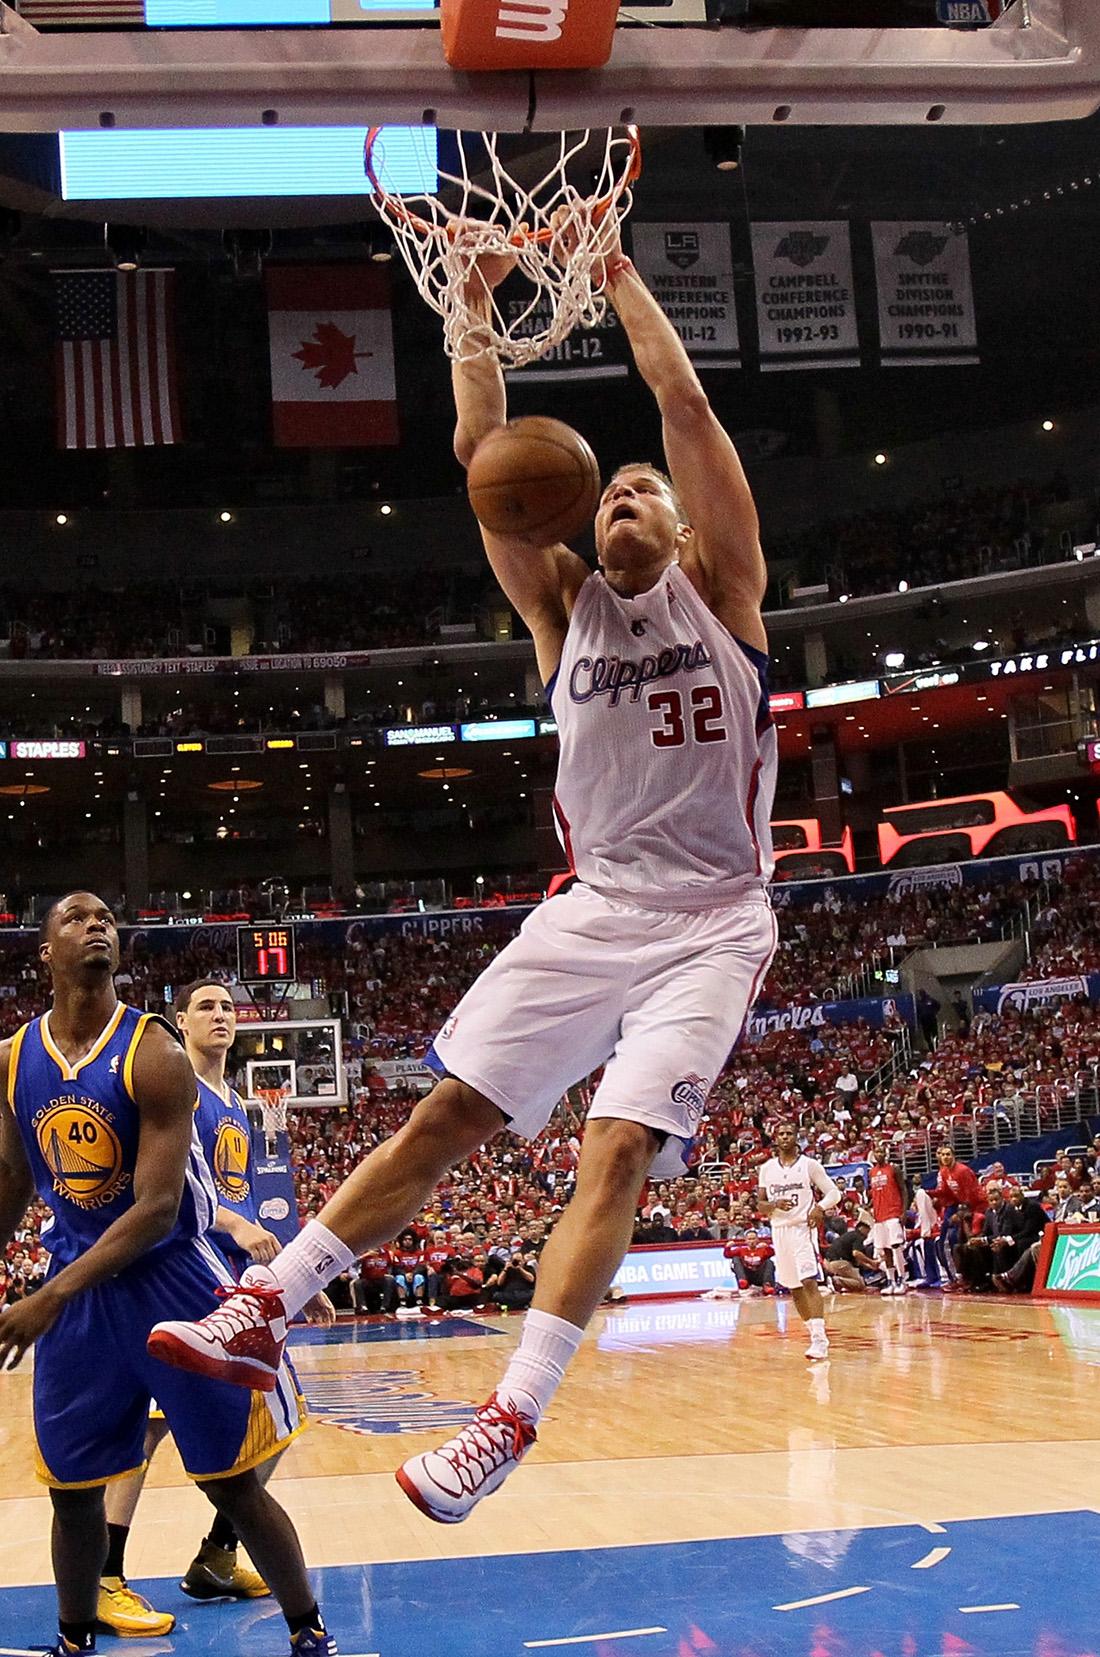 BLAKE GRIFFIN en viva basquet